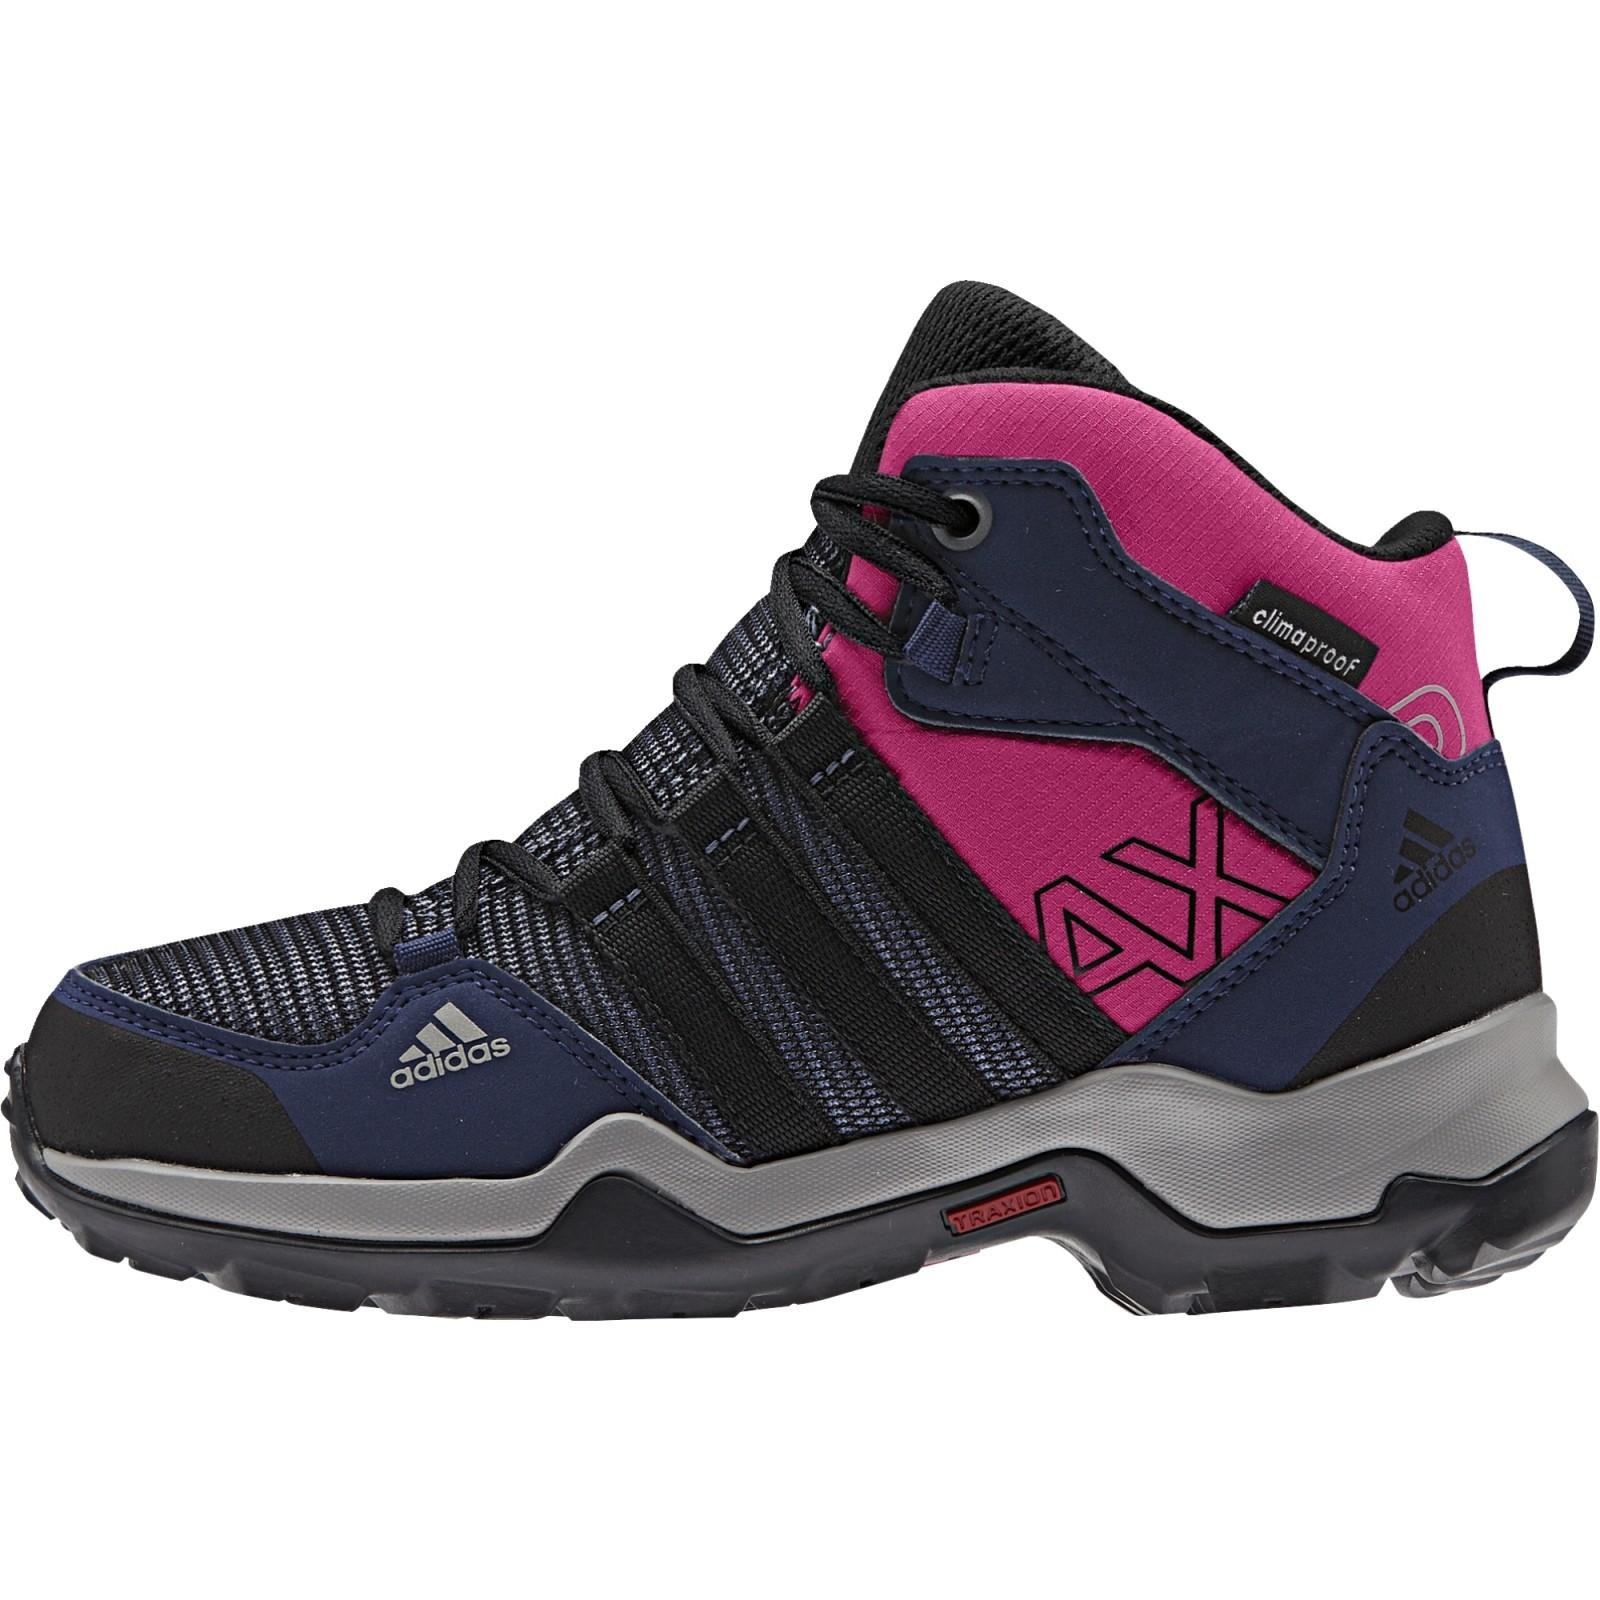 31989786c6c Dětská treková obuv adidas AX2 MID CP K